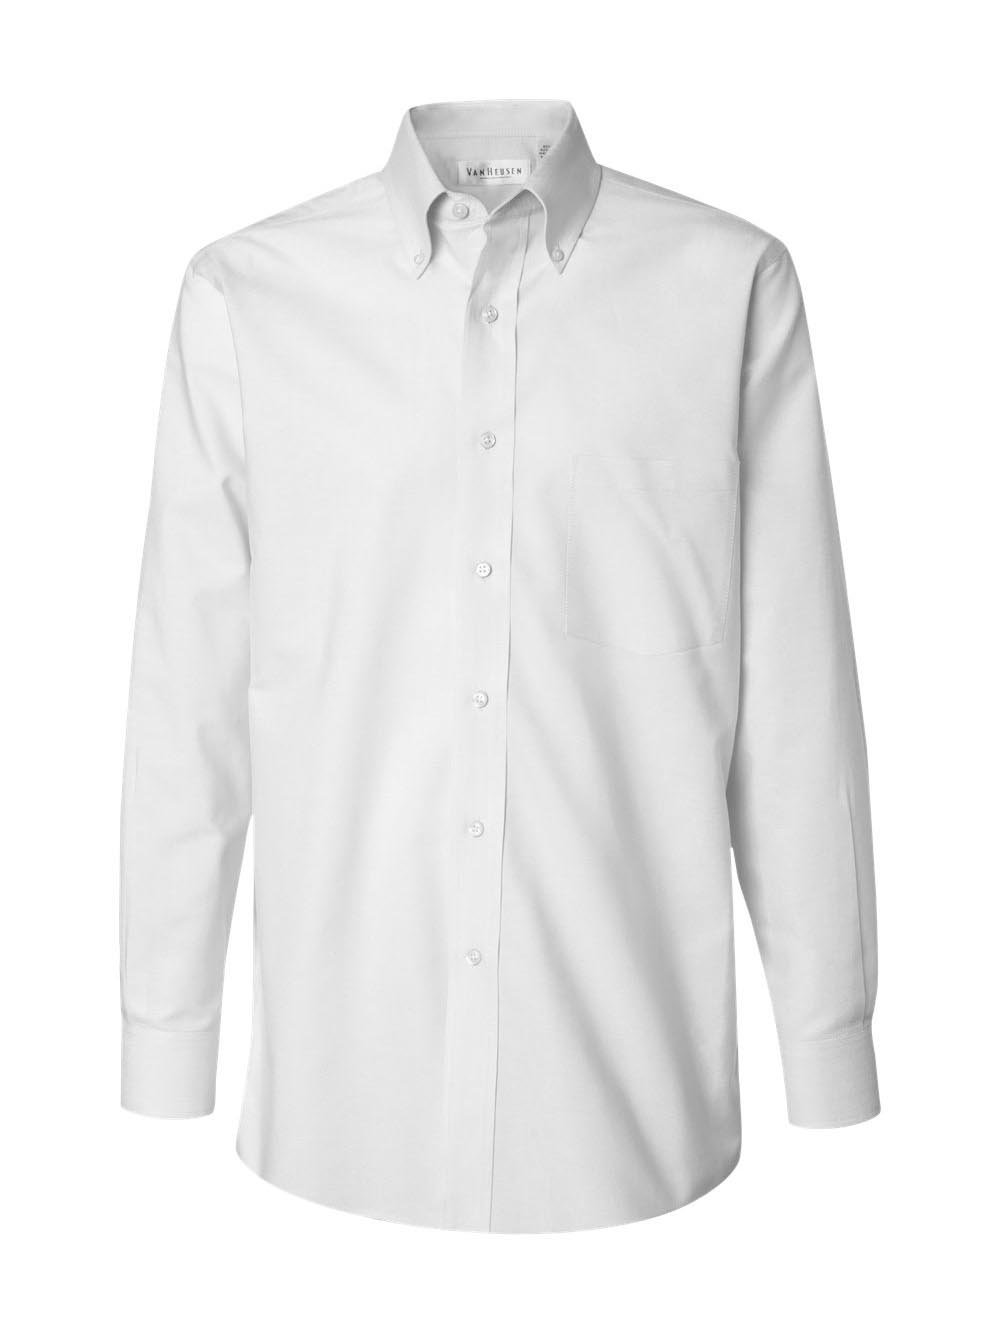 Van Heusen 56900 Men'S Wrinkle-Resistant Blended Pinpoint Oxford - White - 3Xl